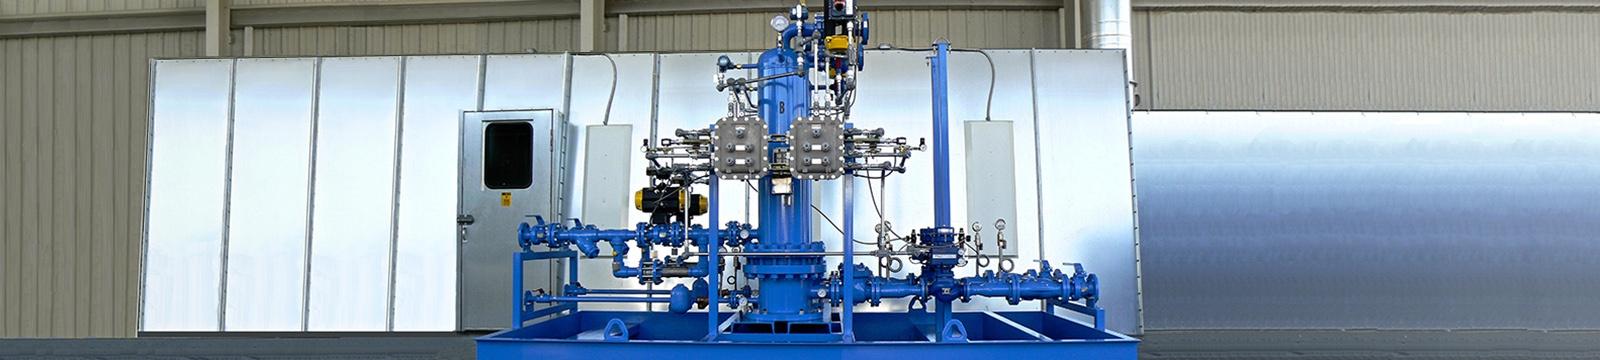 Vertical Steam Vaporizers - LPG Propane Butane - Engineering - Skids_2.jpg